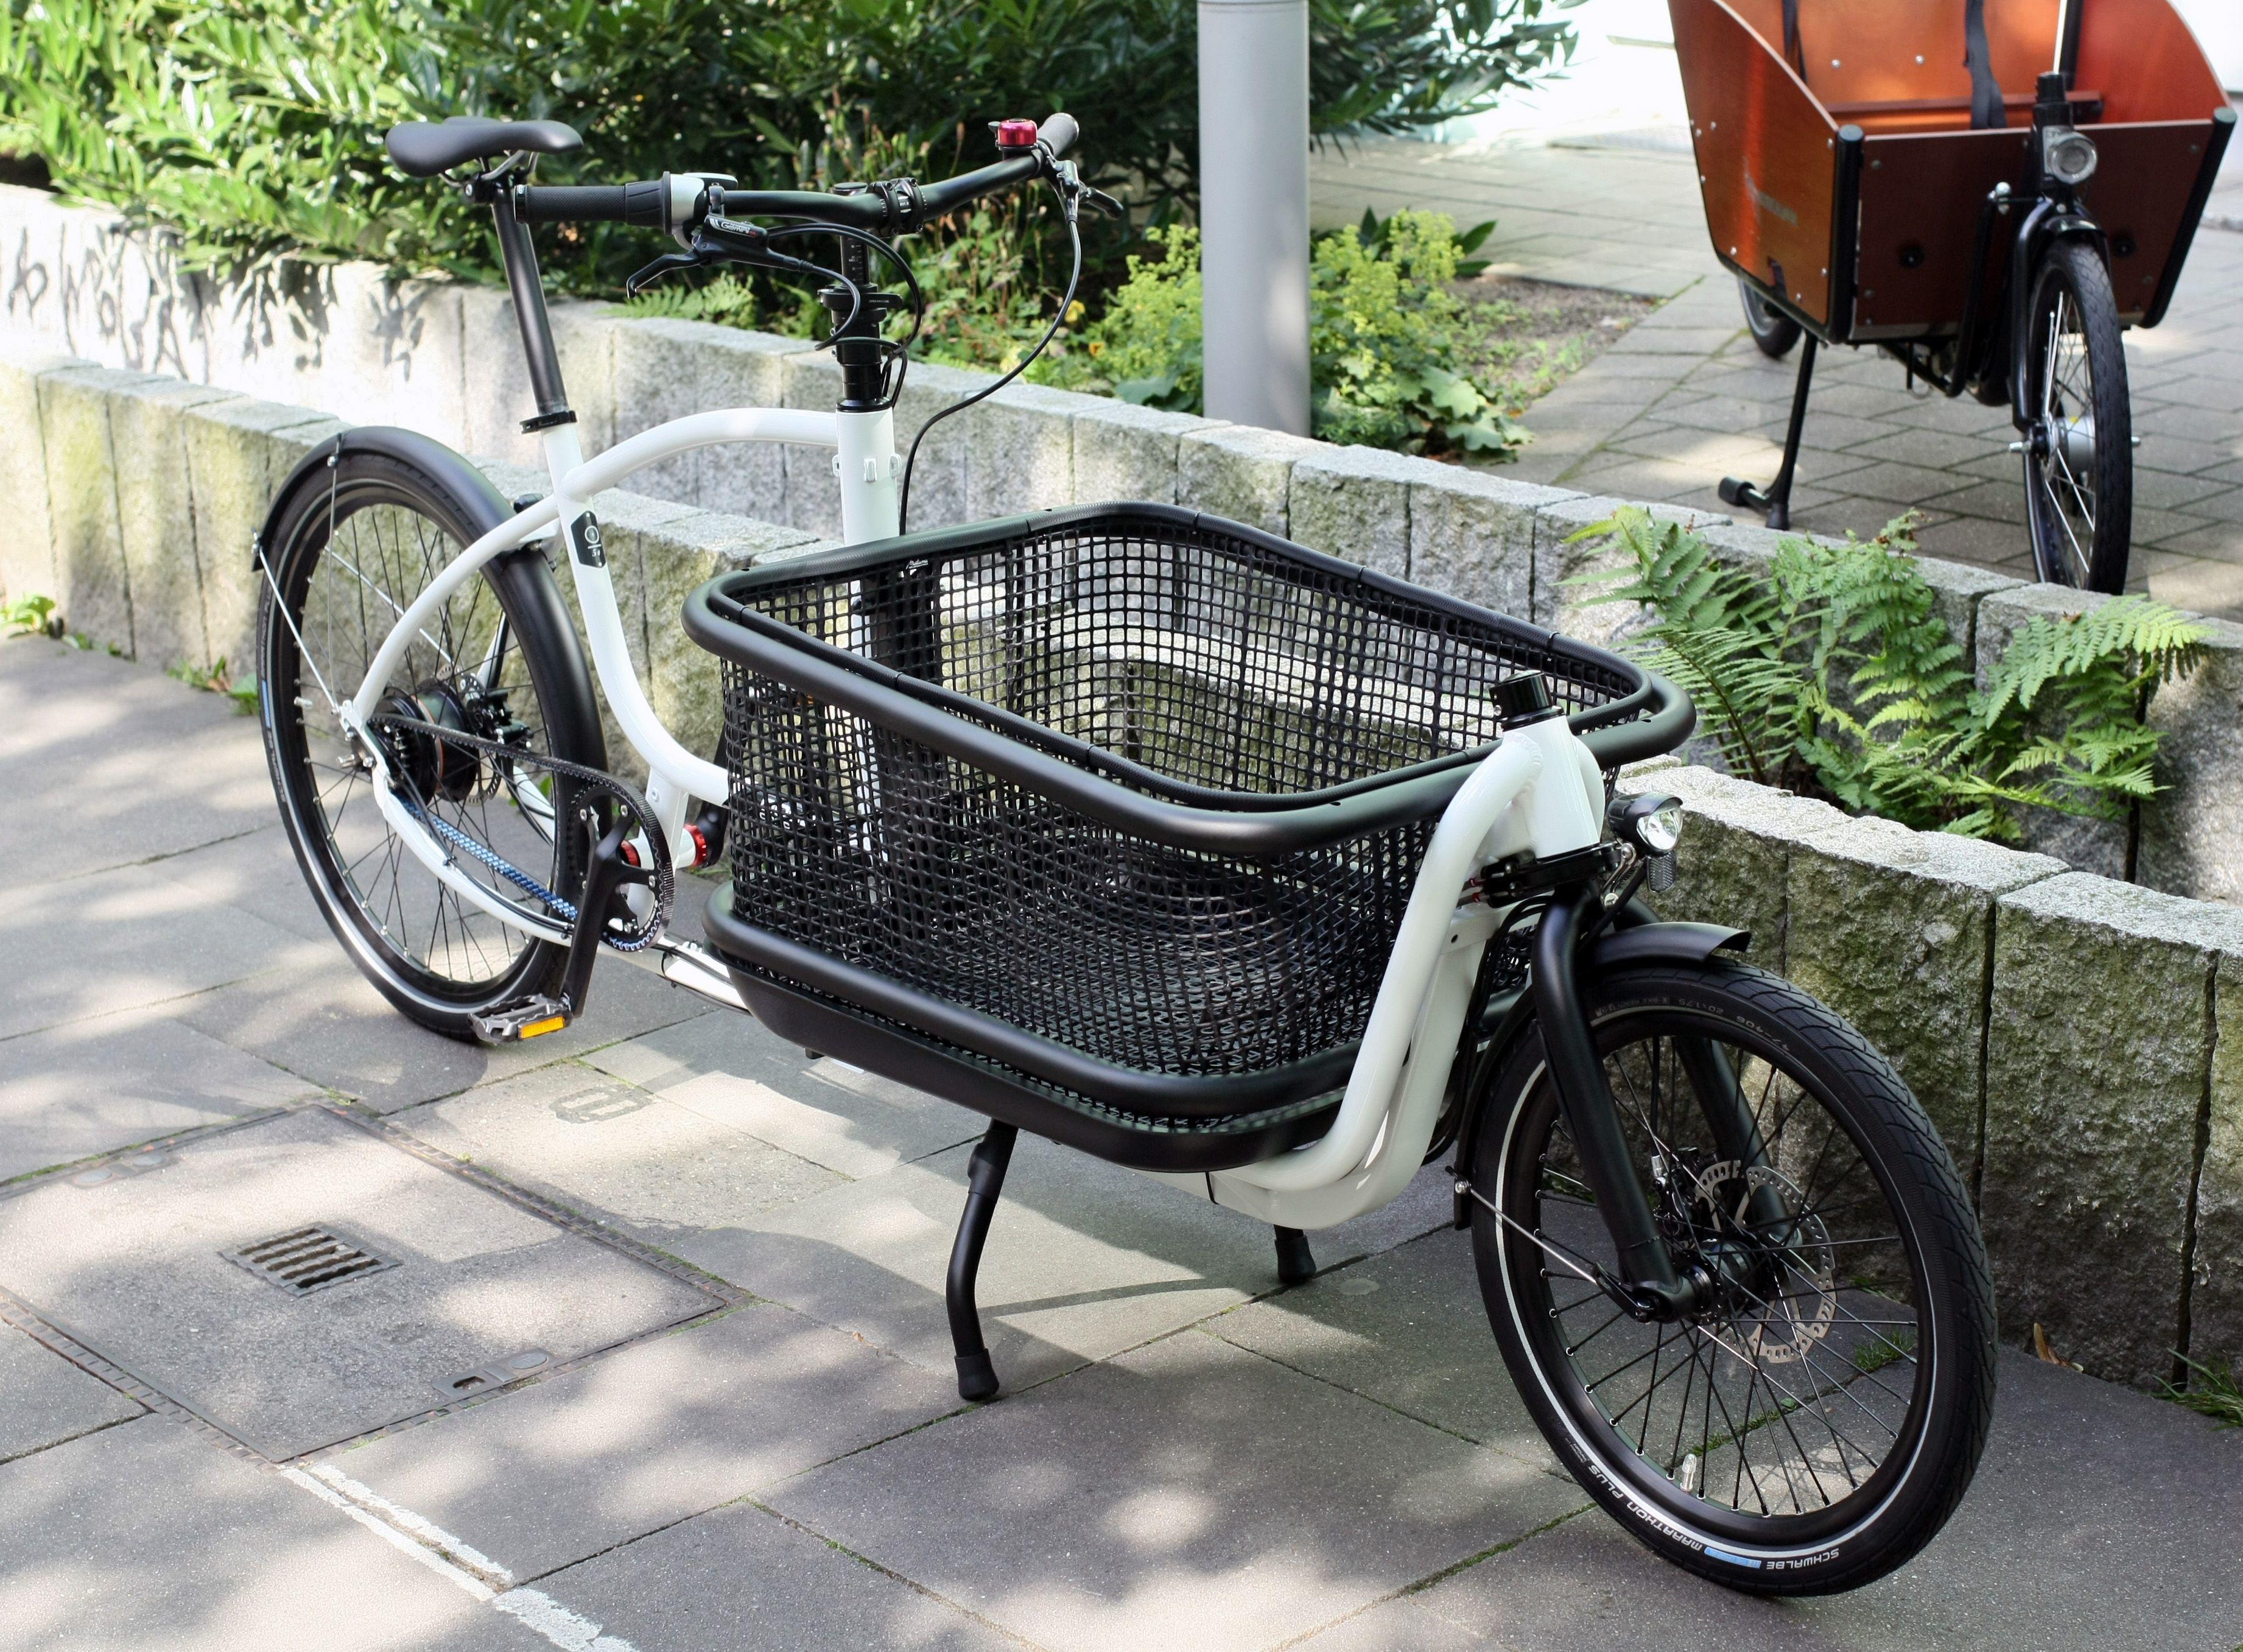 Douze Cycle in Standardlänge Weiß - #NuVinci N360 stufenloses Schaltgetriebe - #Lastenrad #cargobike